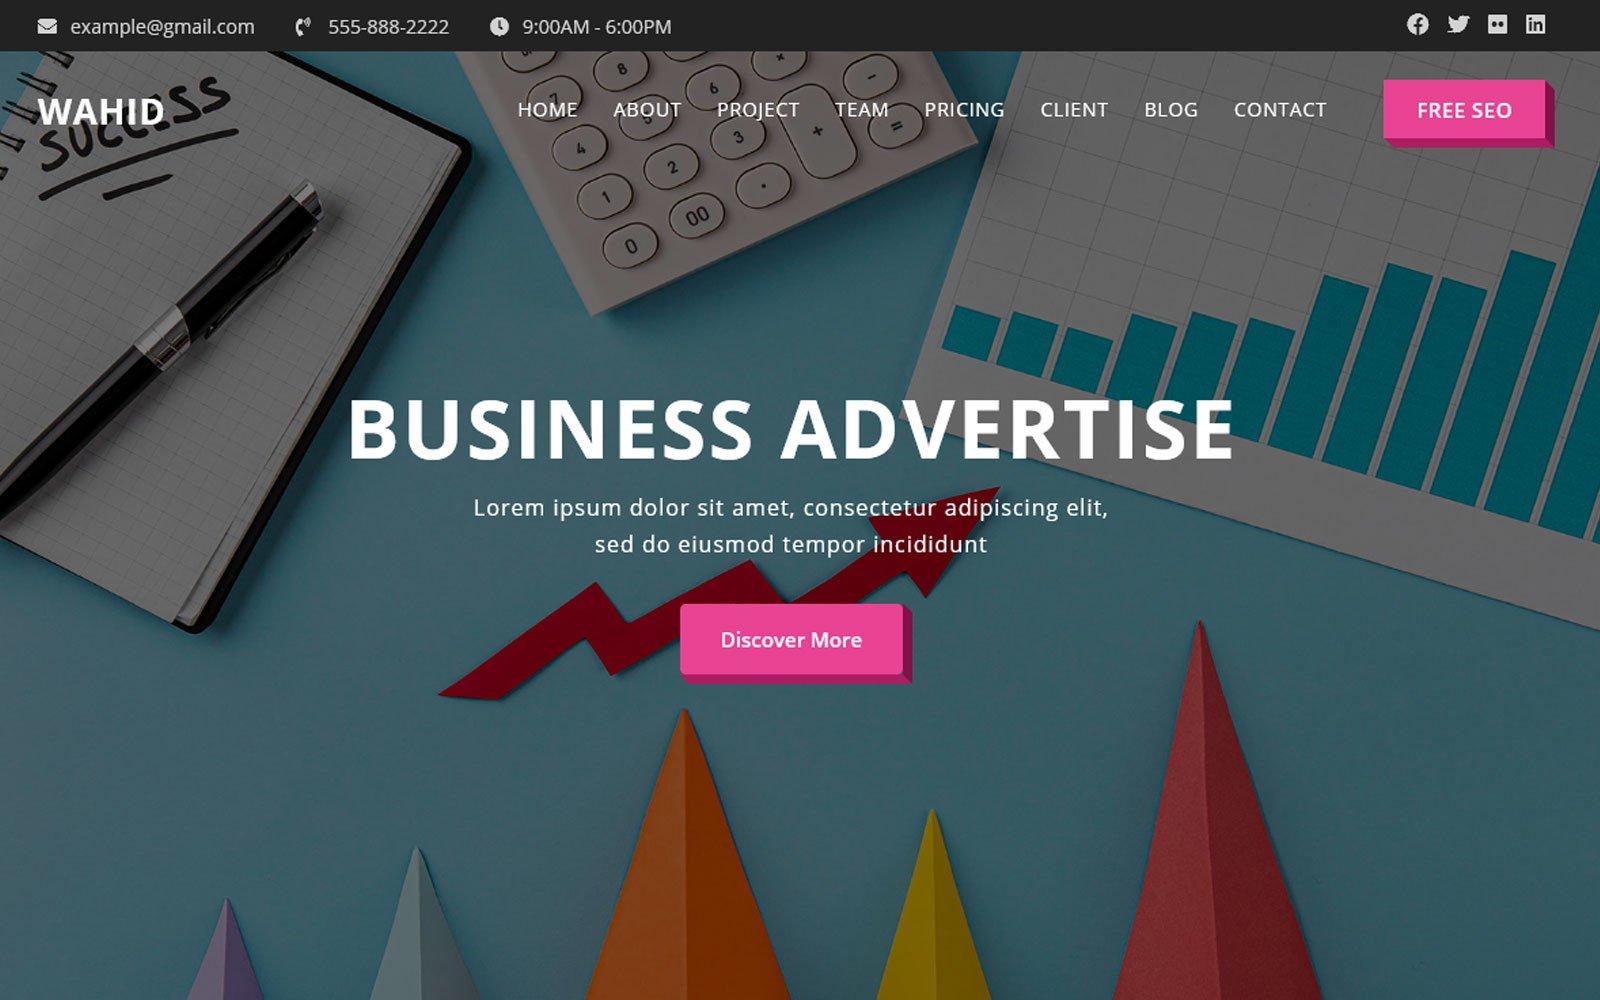 Wahid - Advertising Html5 Landing Page Theme